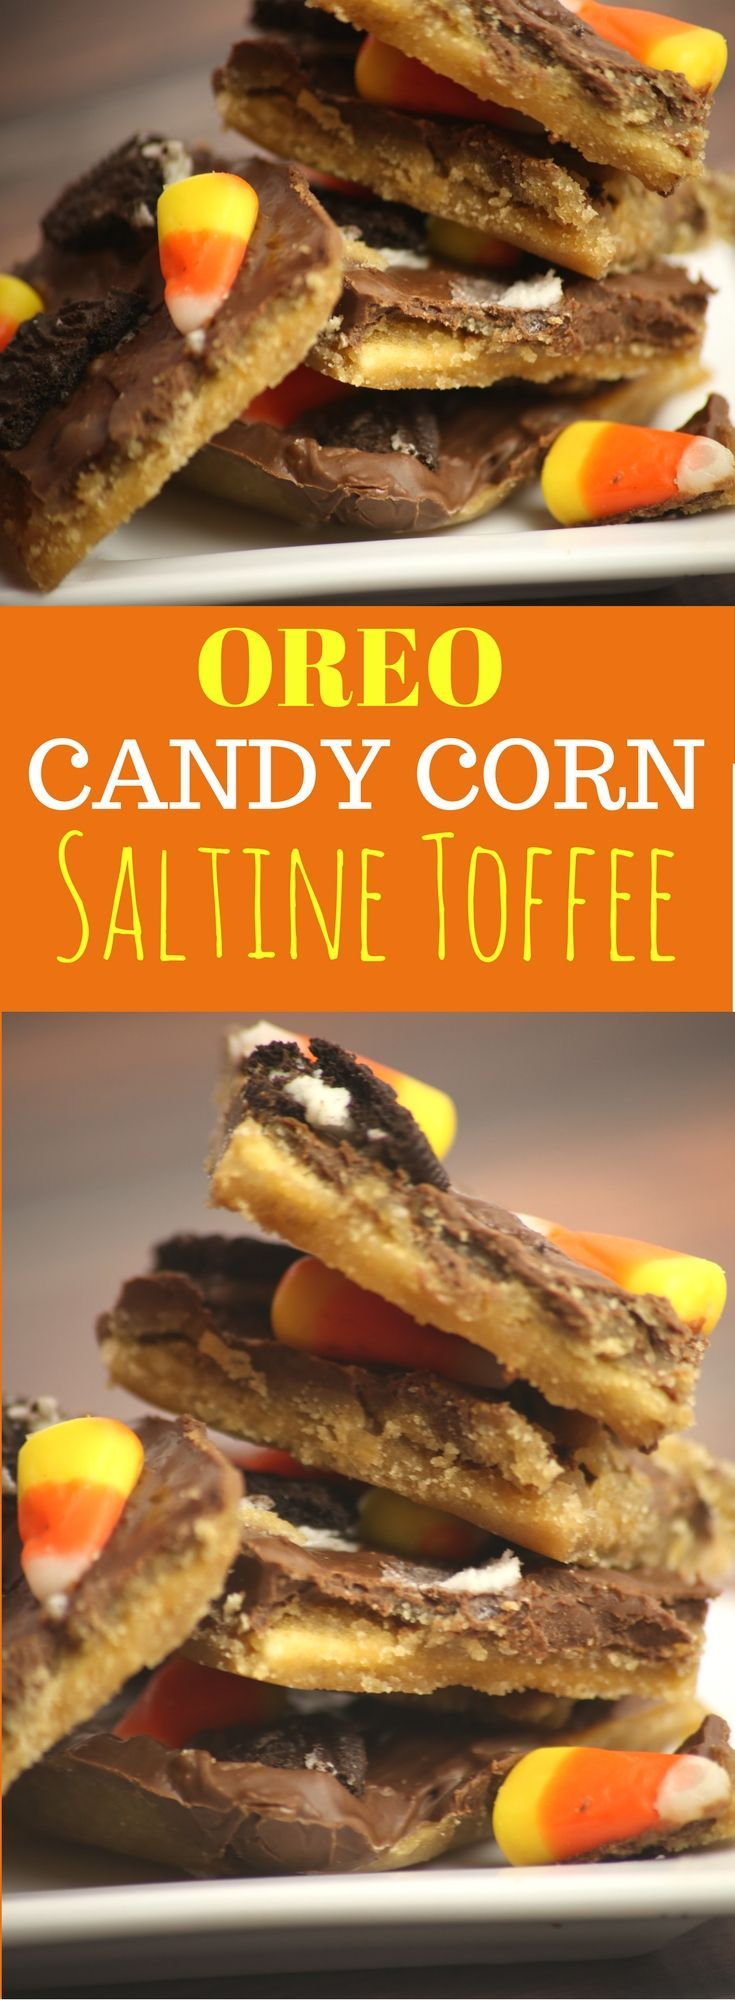 Best 25+ Saltine cracker recipes ideas only on Pinterest | Cracker ...